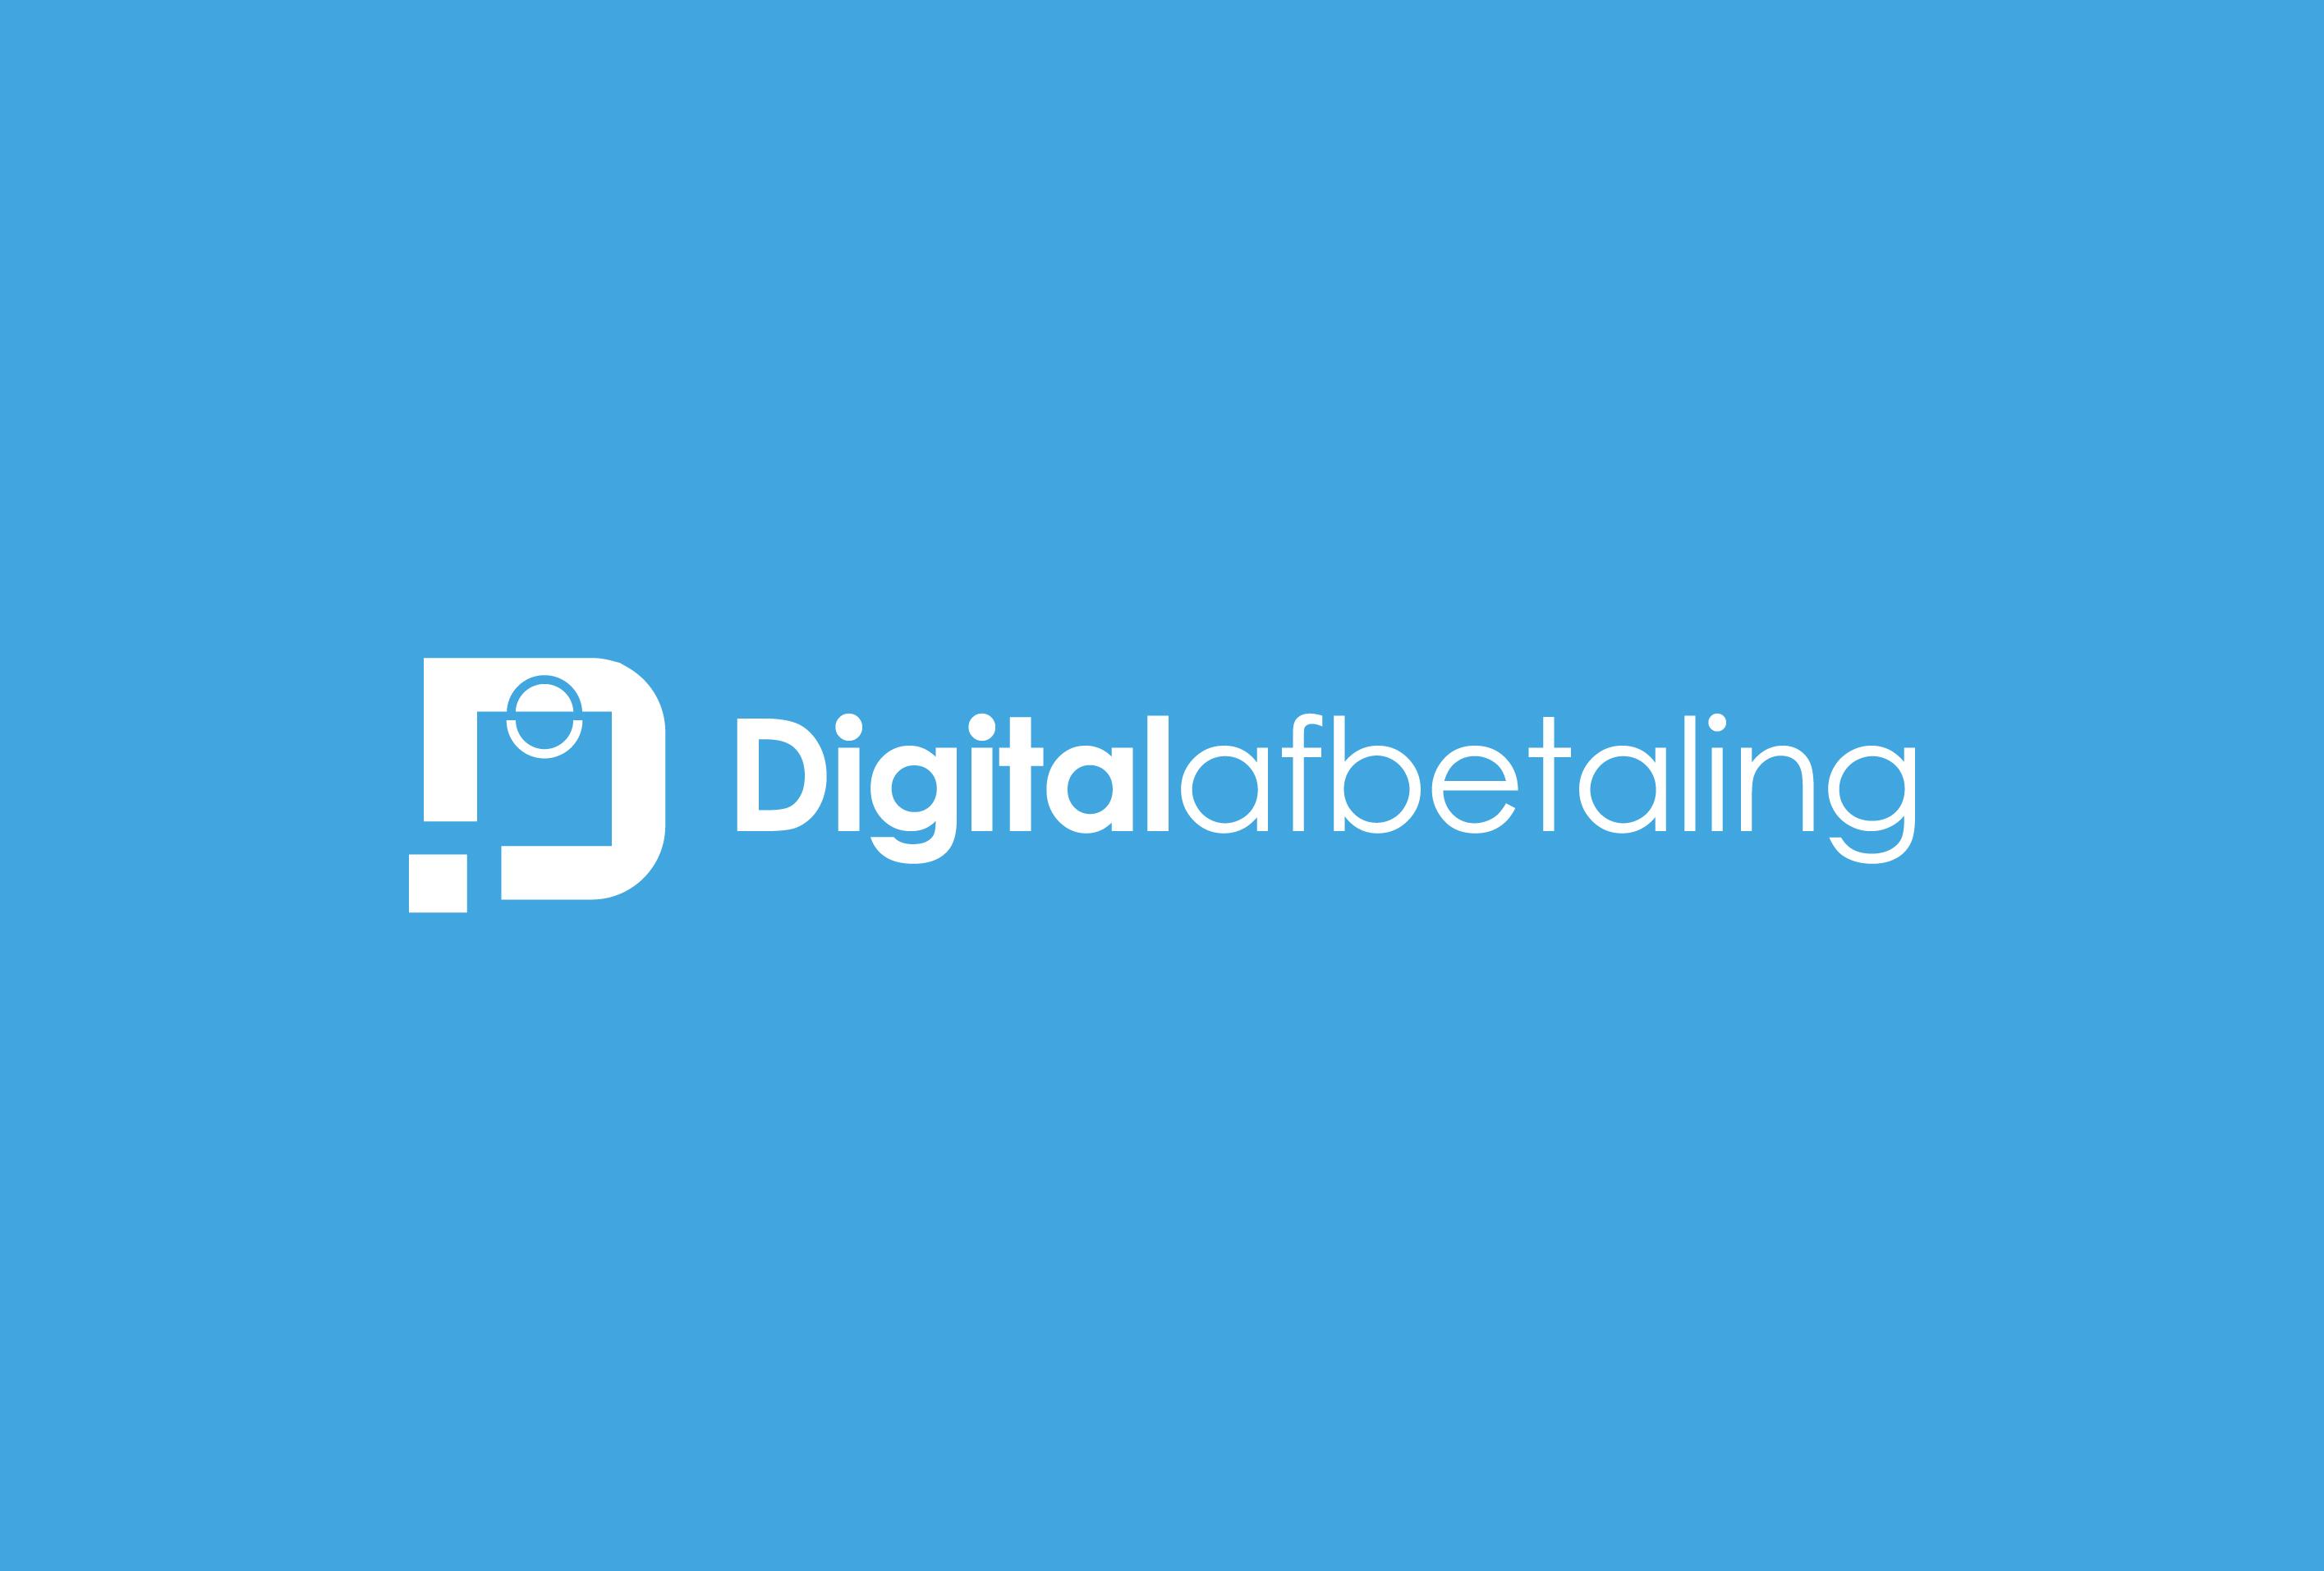 MM_Digitalafbetaling-02.jpg